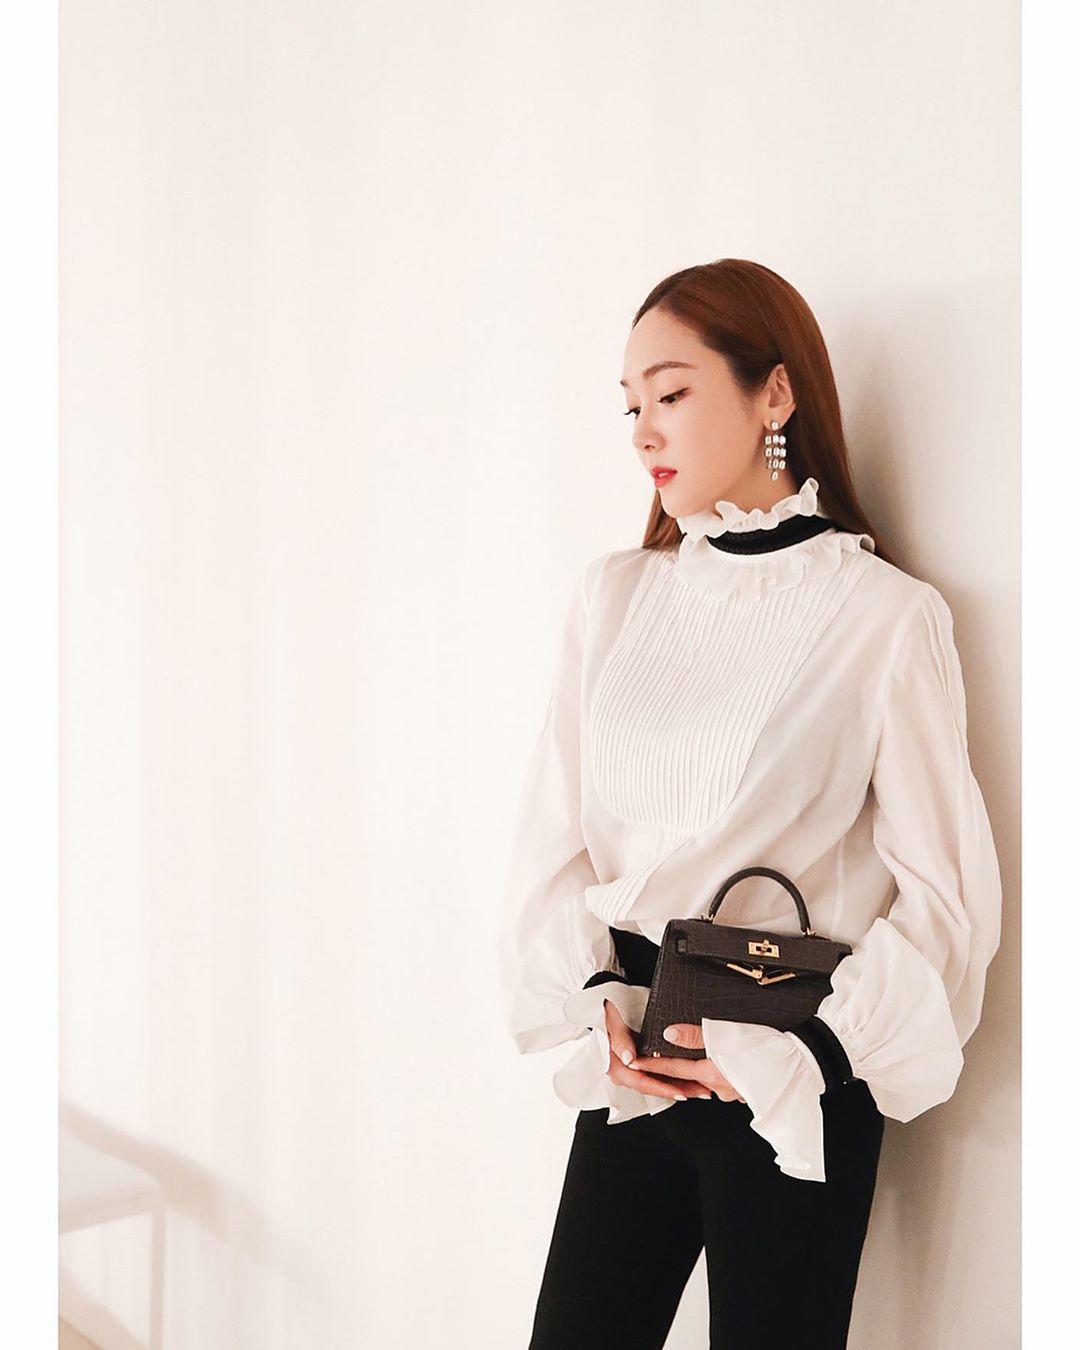 Dress code formal - Jessica Jung mặc sơ mi cổ điển